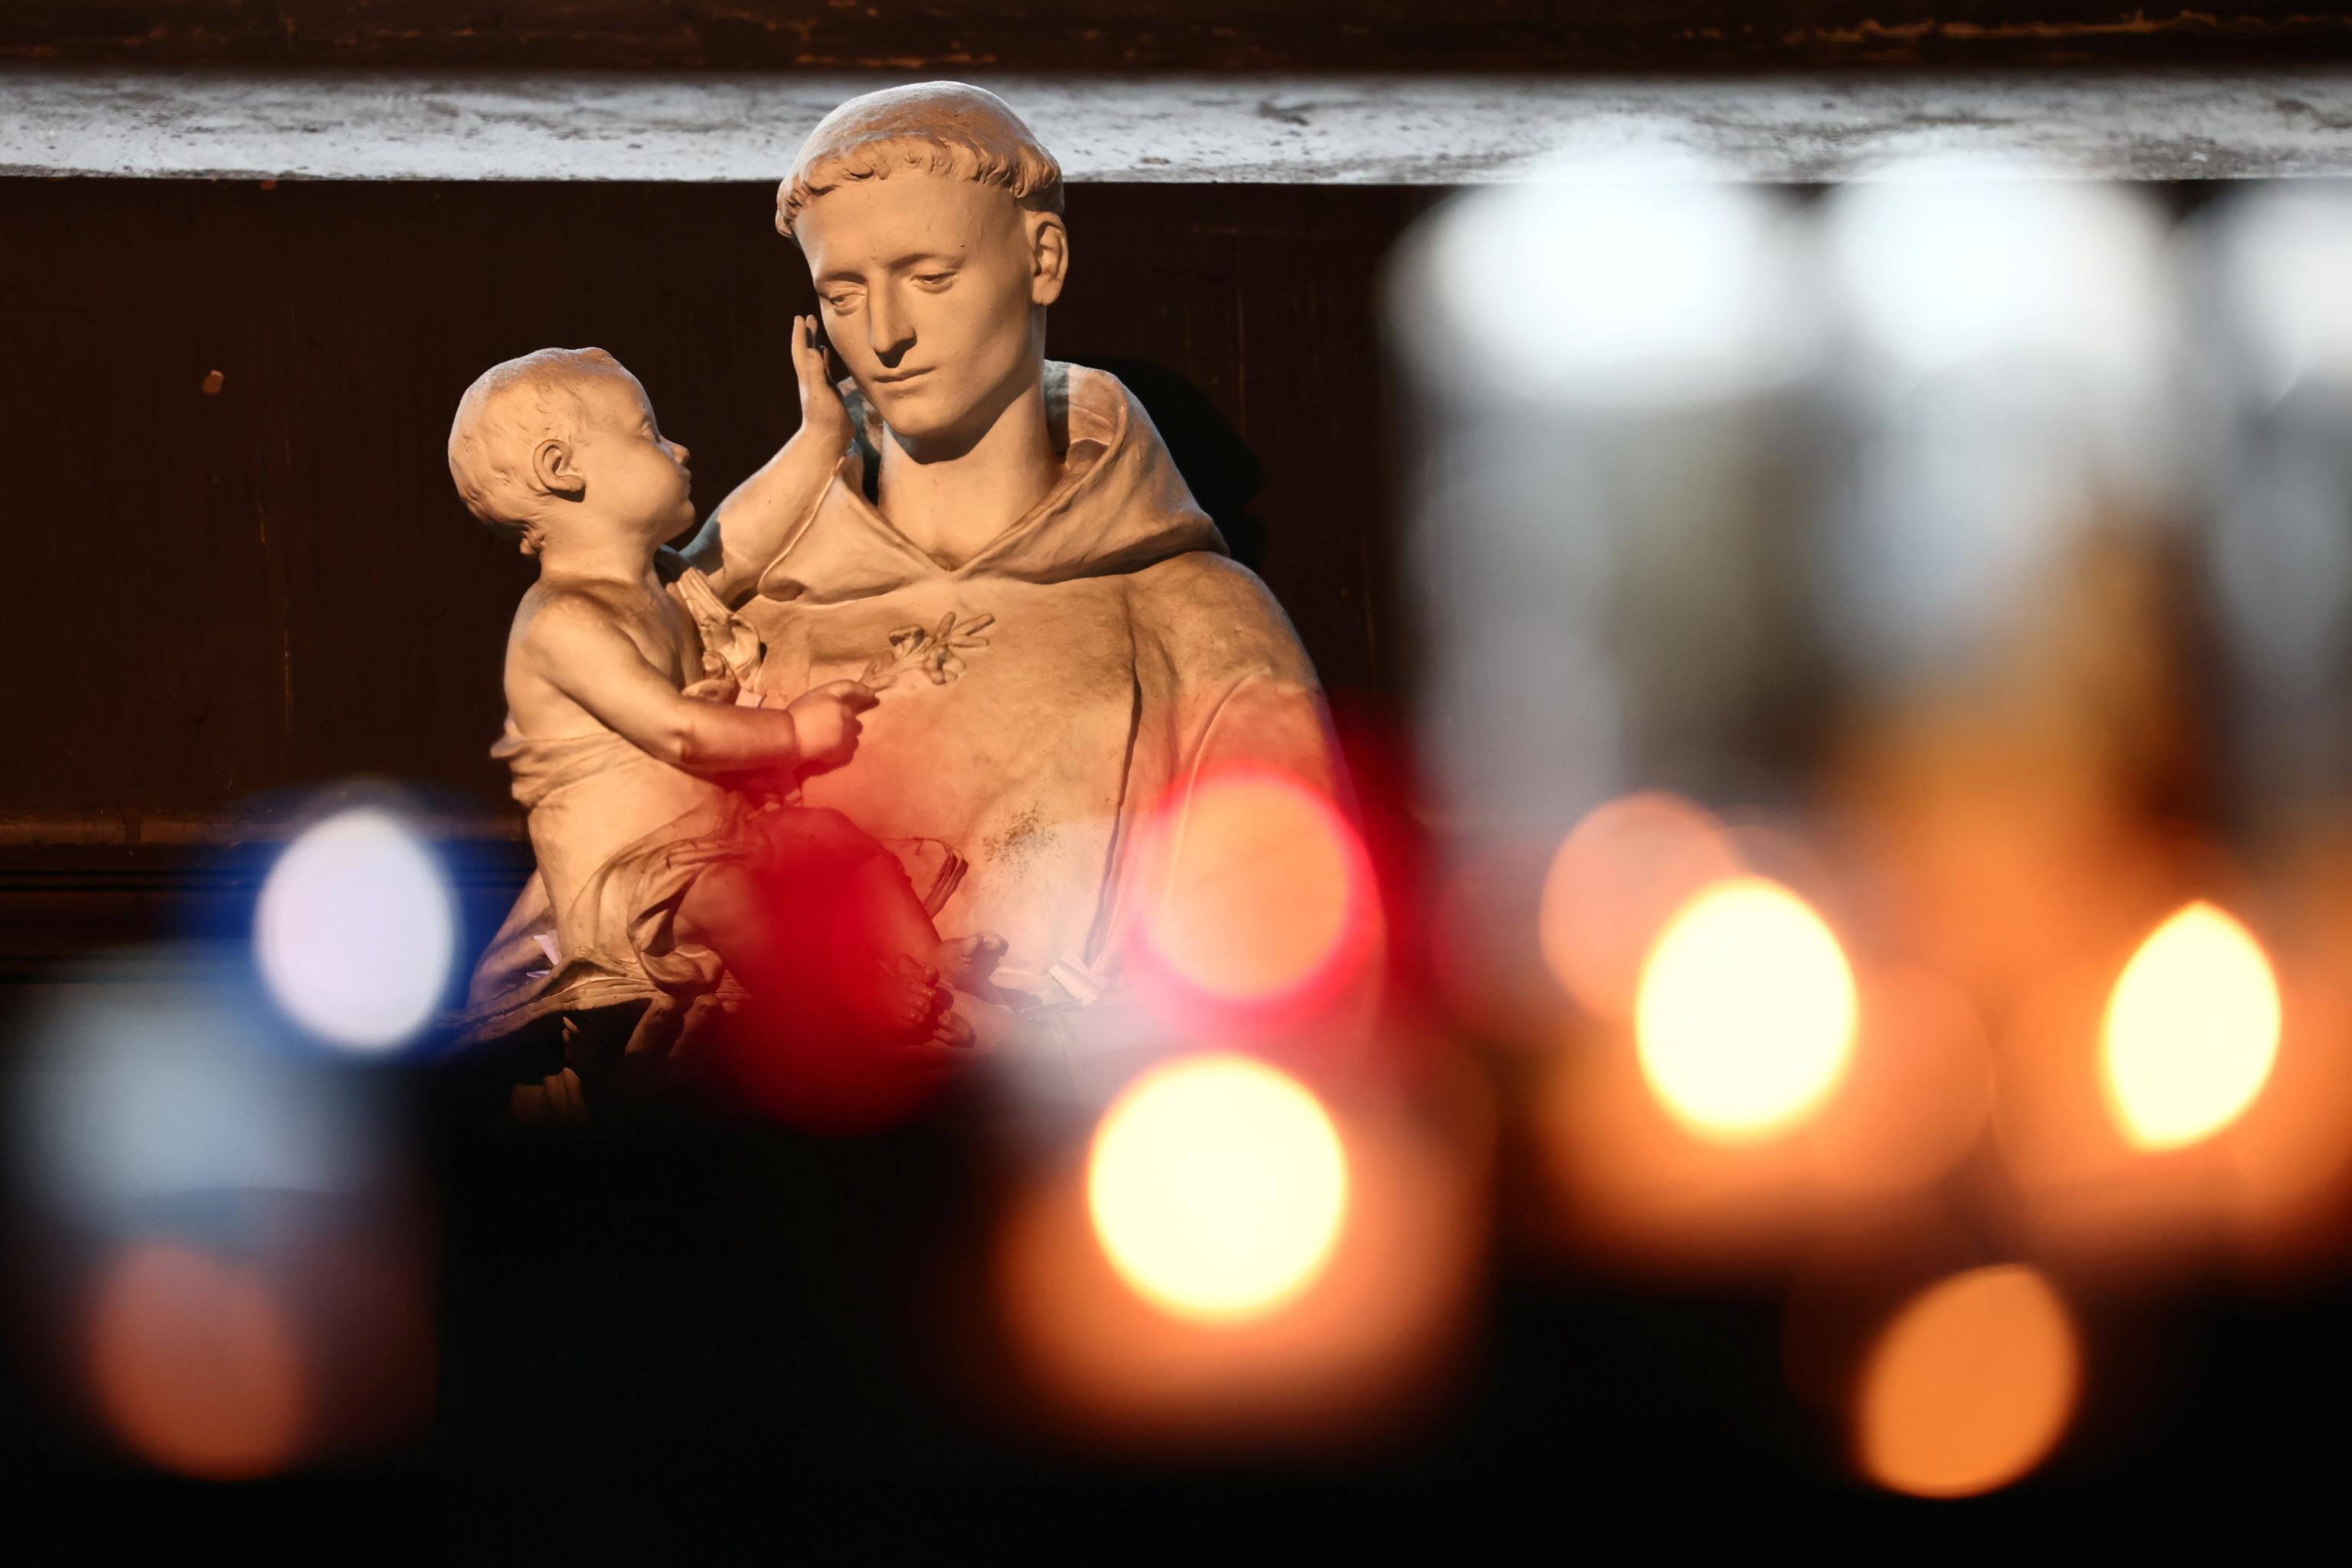 Estarua سنت آنتونی در کلیسای Saint-Sulpice (par